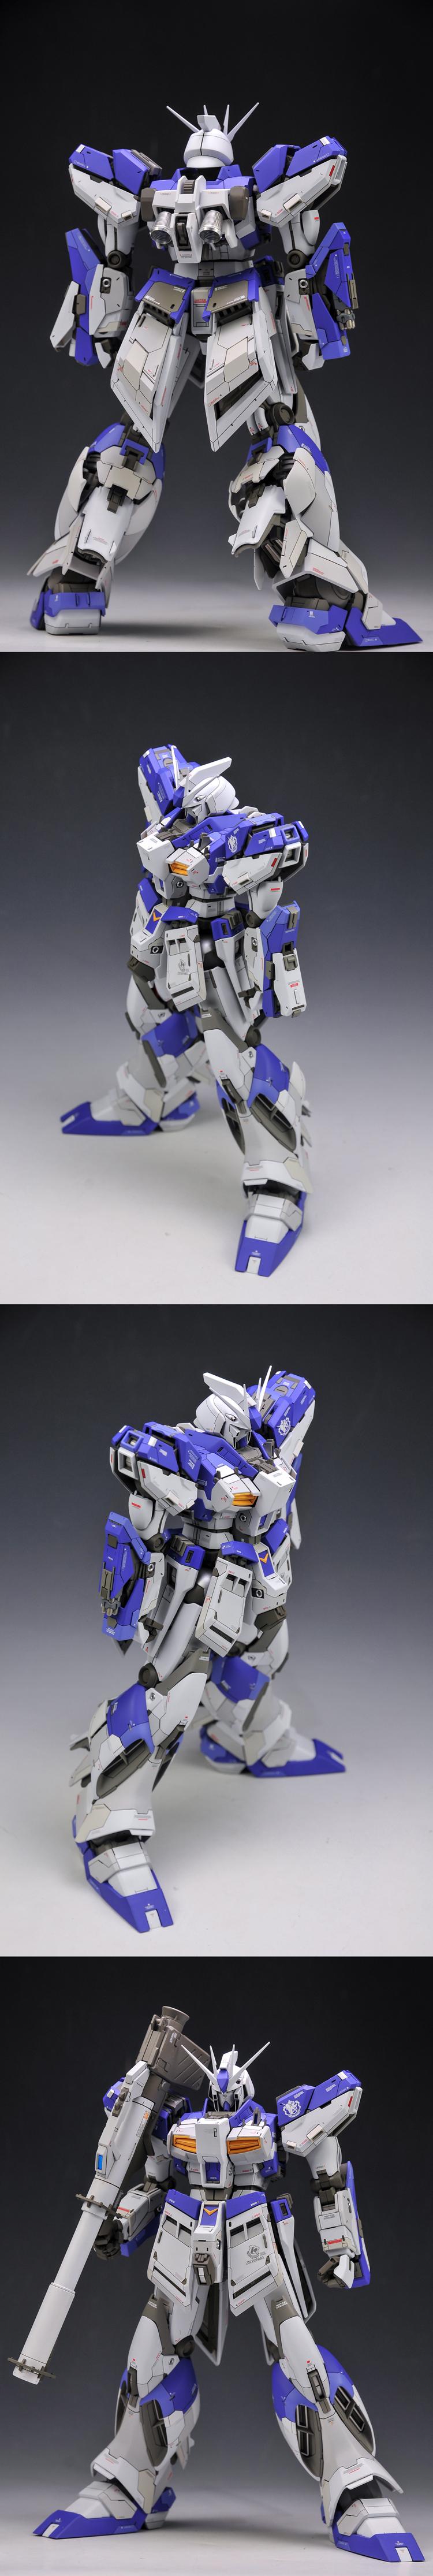 G91-mg-hi-nu-vsproject-info1-inask-007.jpg